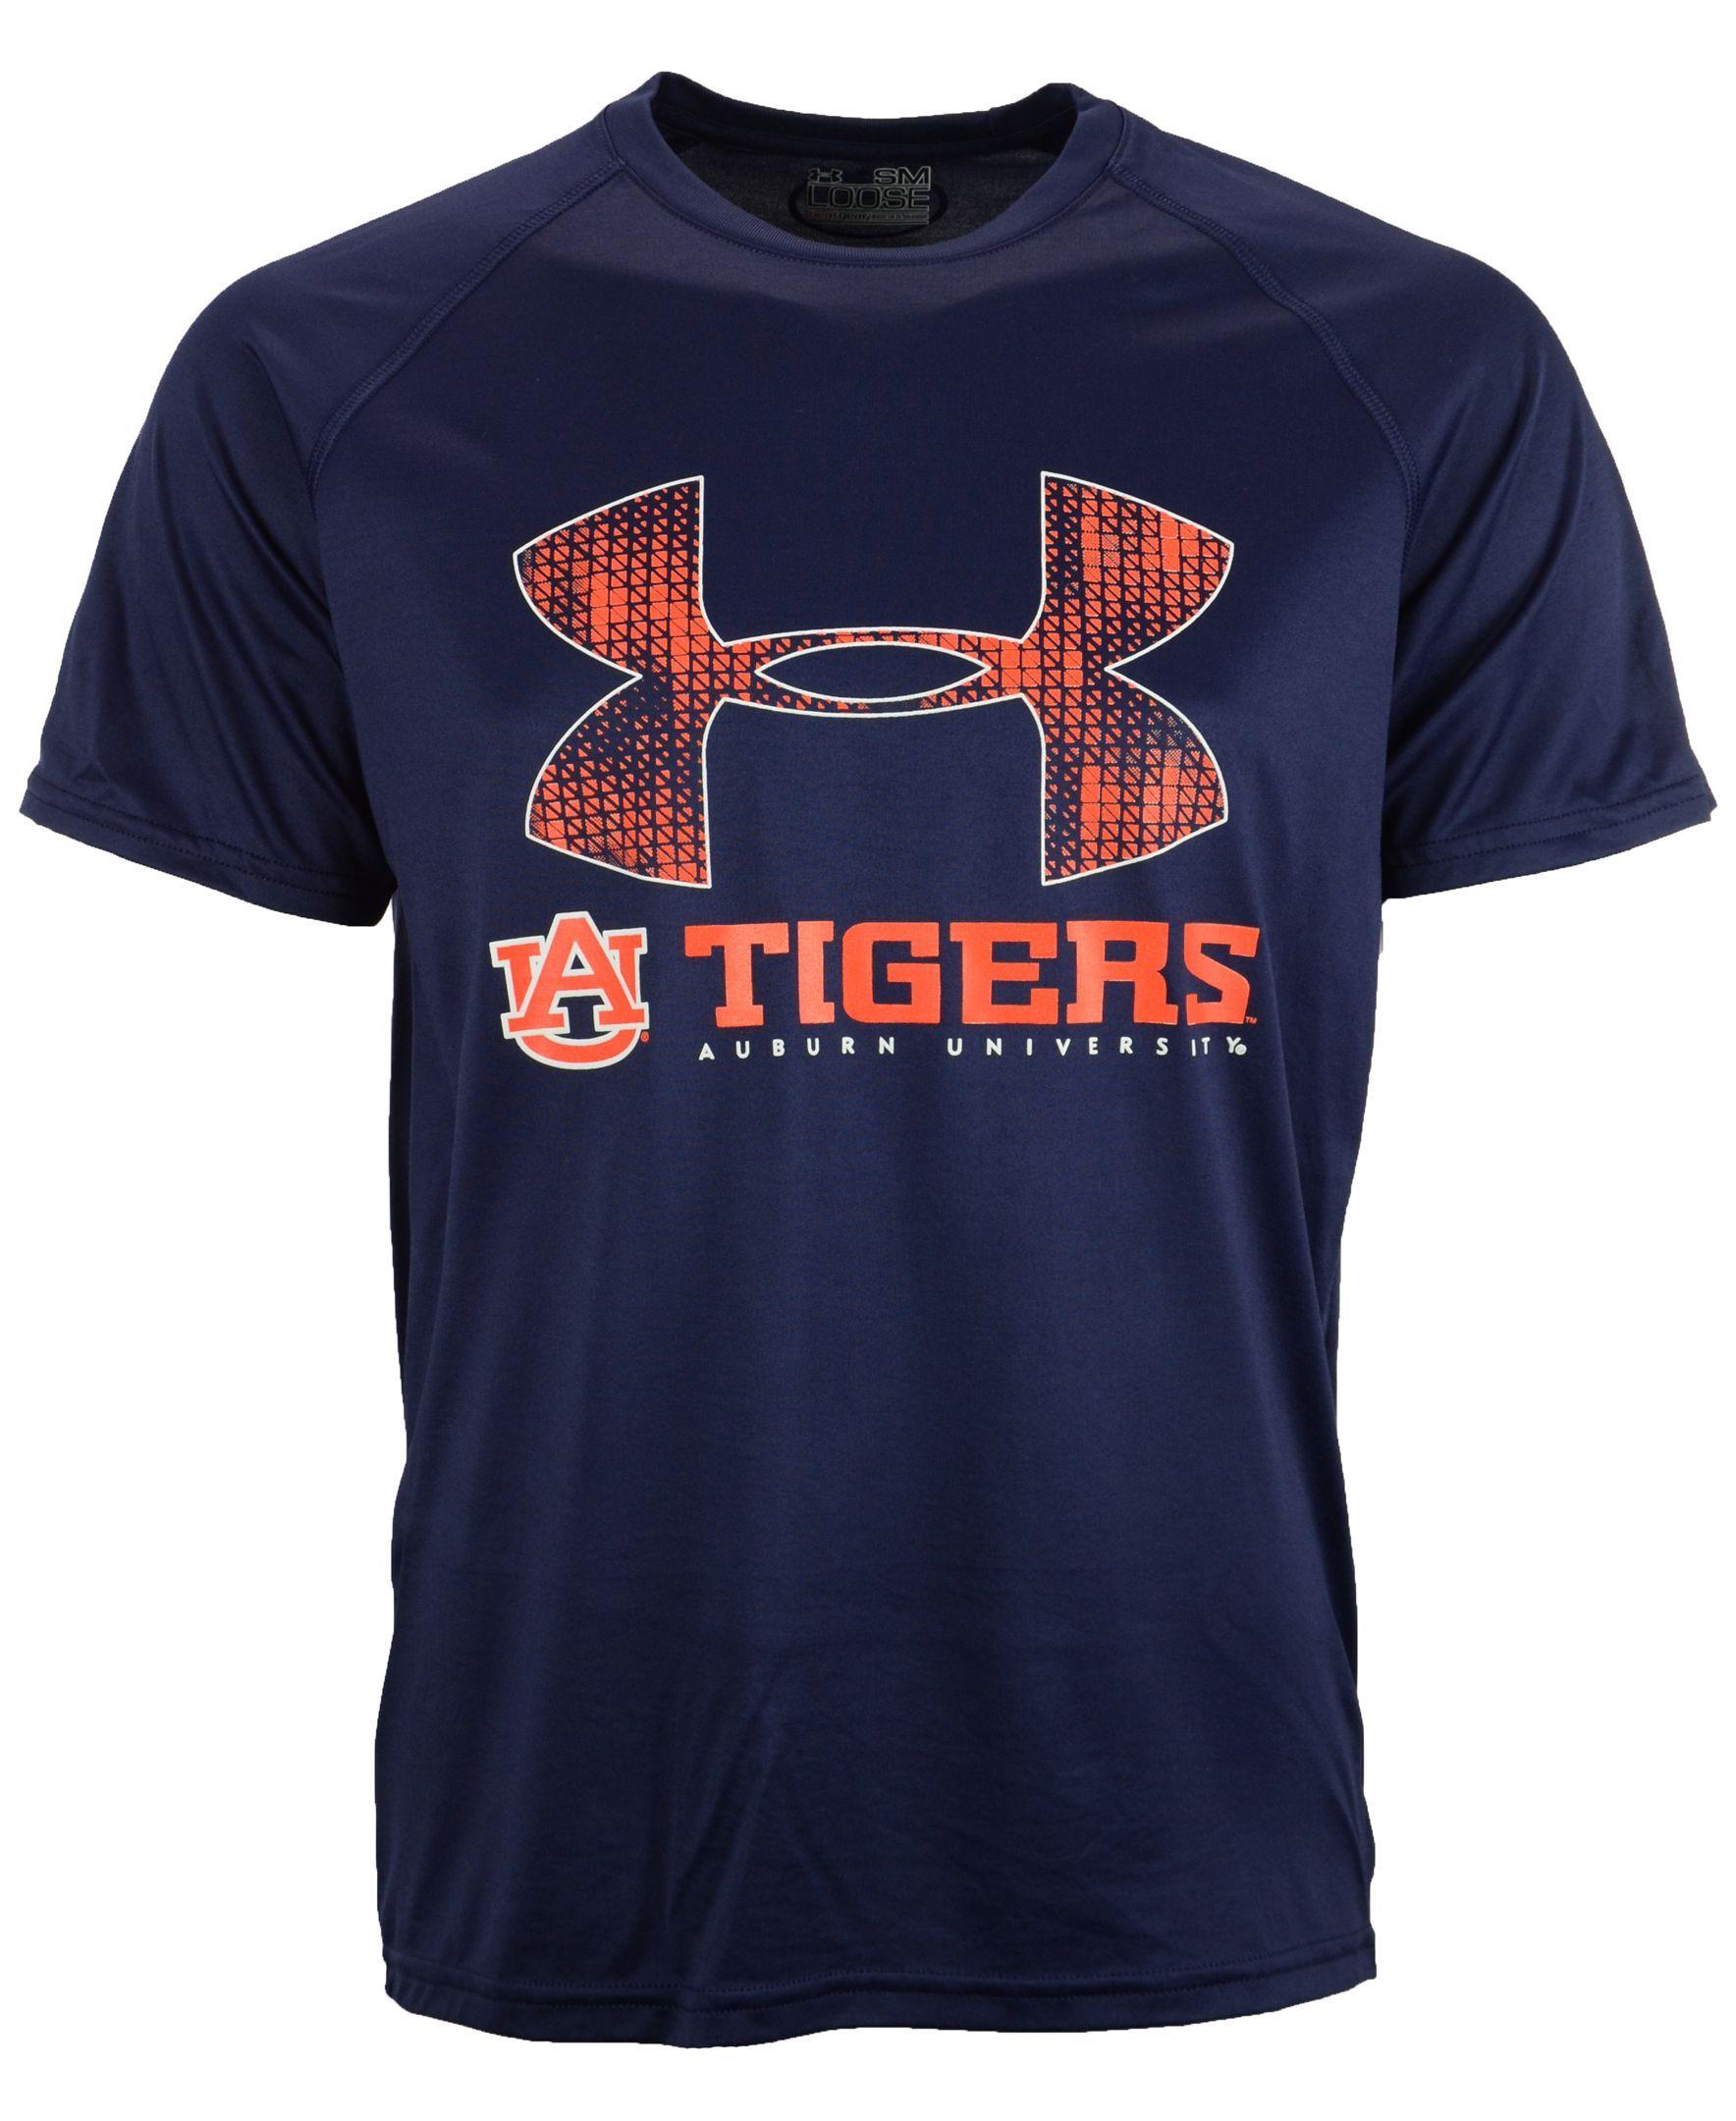 fe2f38436 Under Armour Men s Short-Sleeve Auburn Tigers T-Shirt